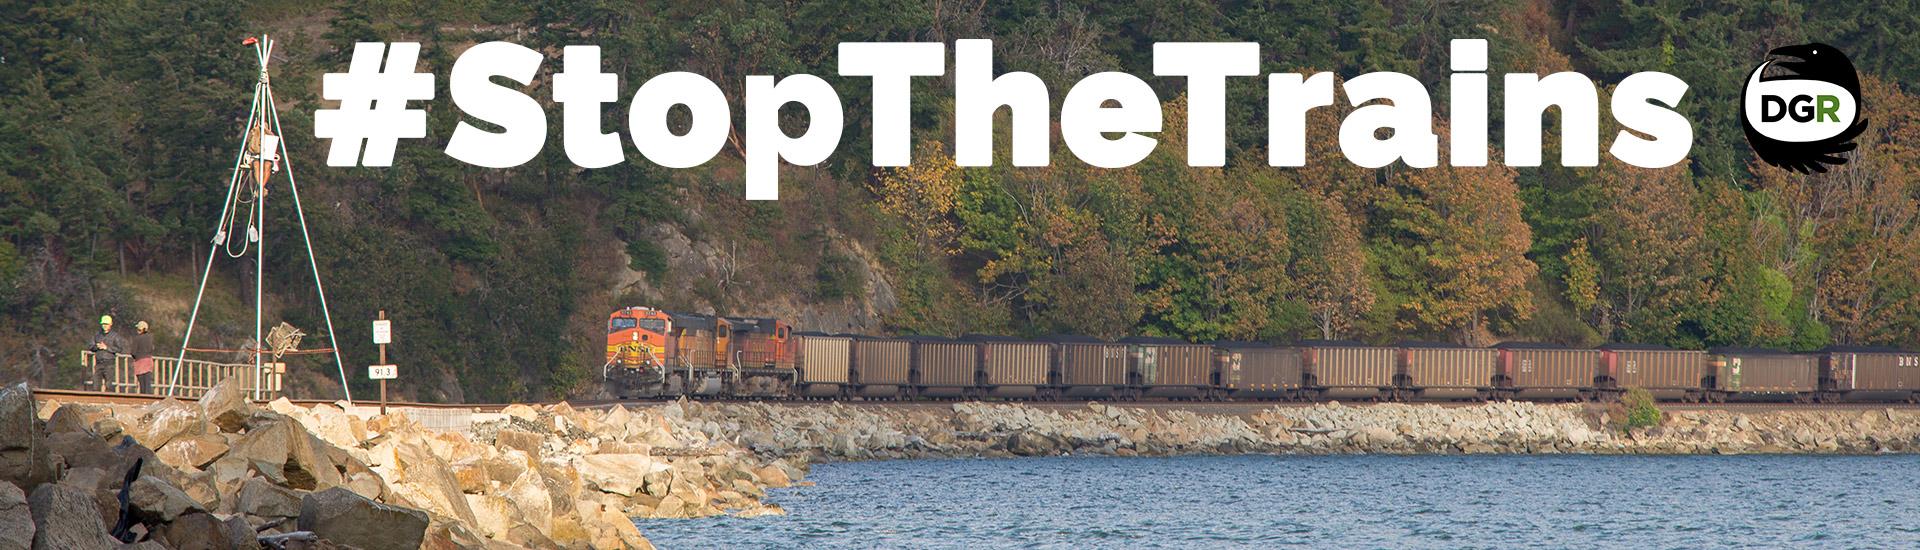 #StopTheTrains blockade direct action Banner